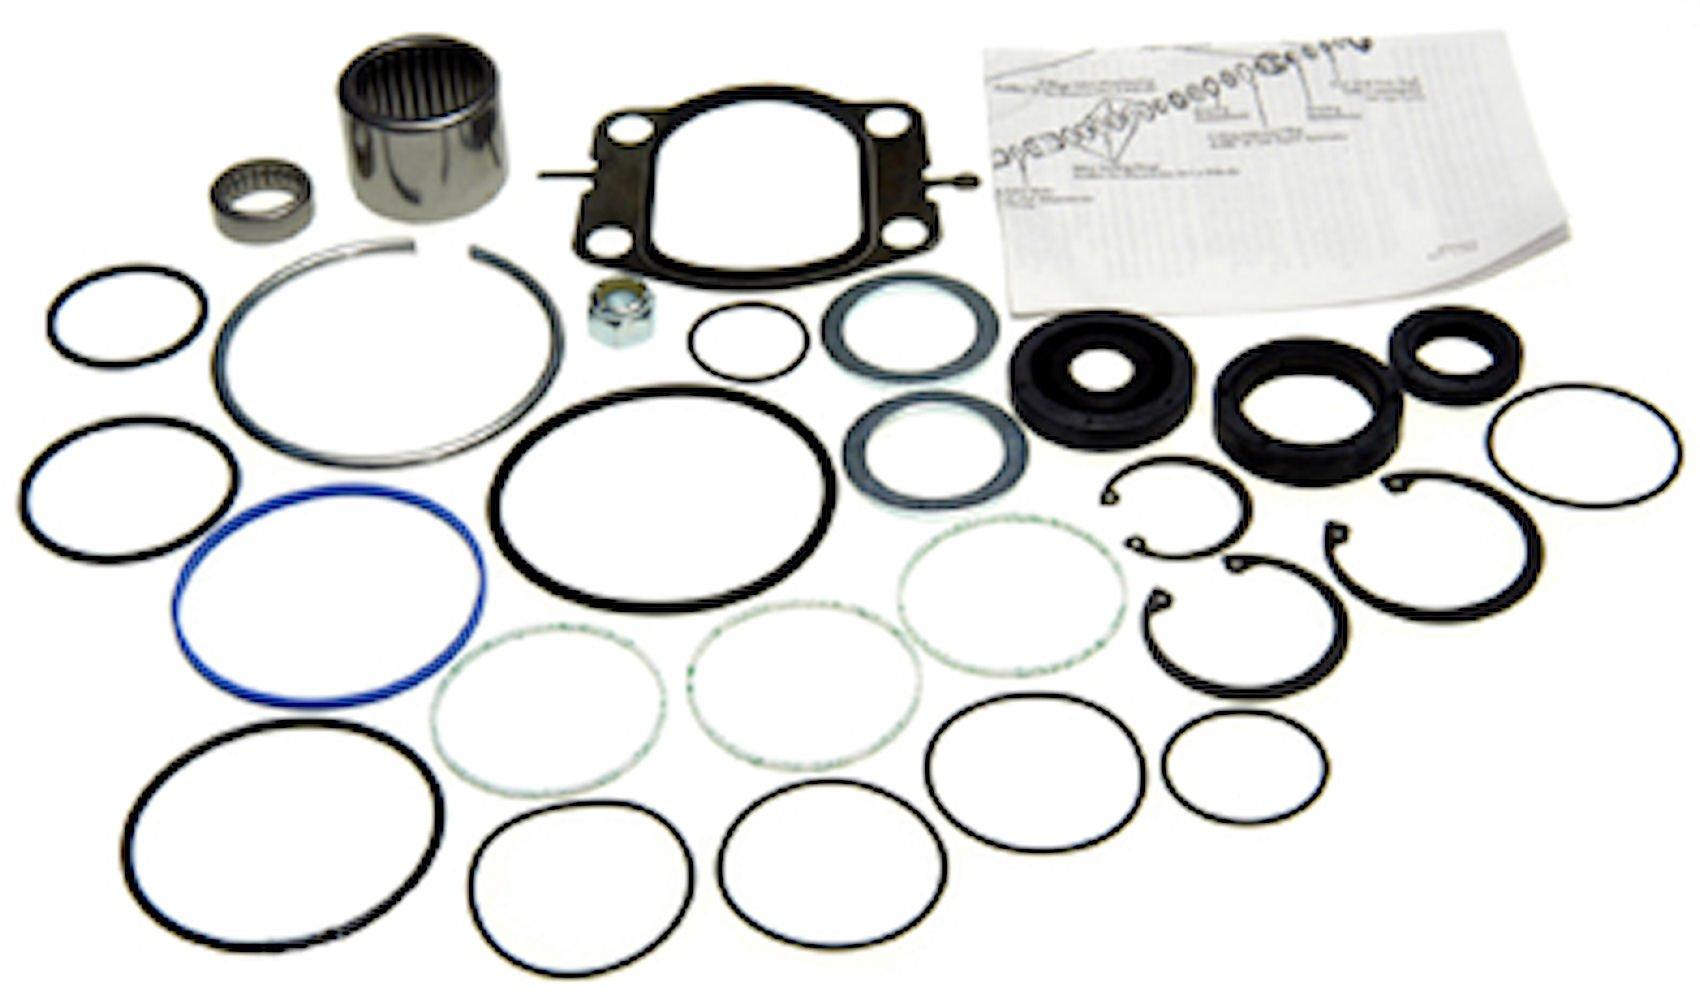 Edelmann 7857 Power Steering Gear Box Complete Rebuild Kit